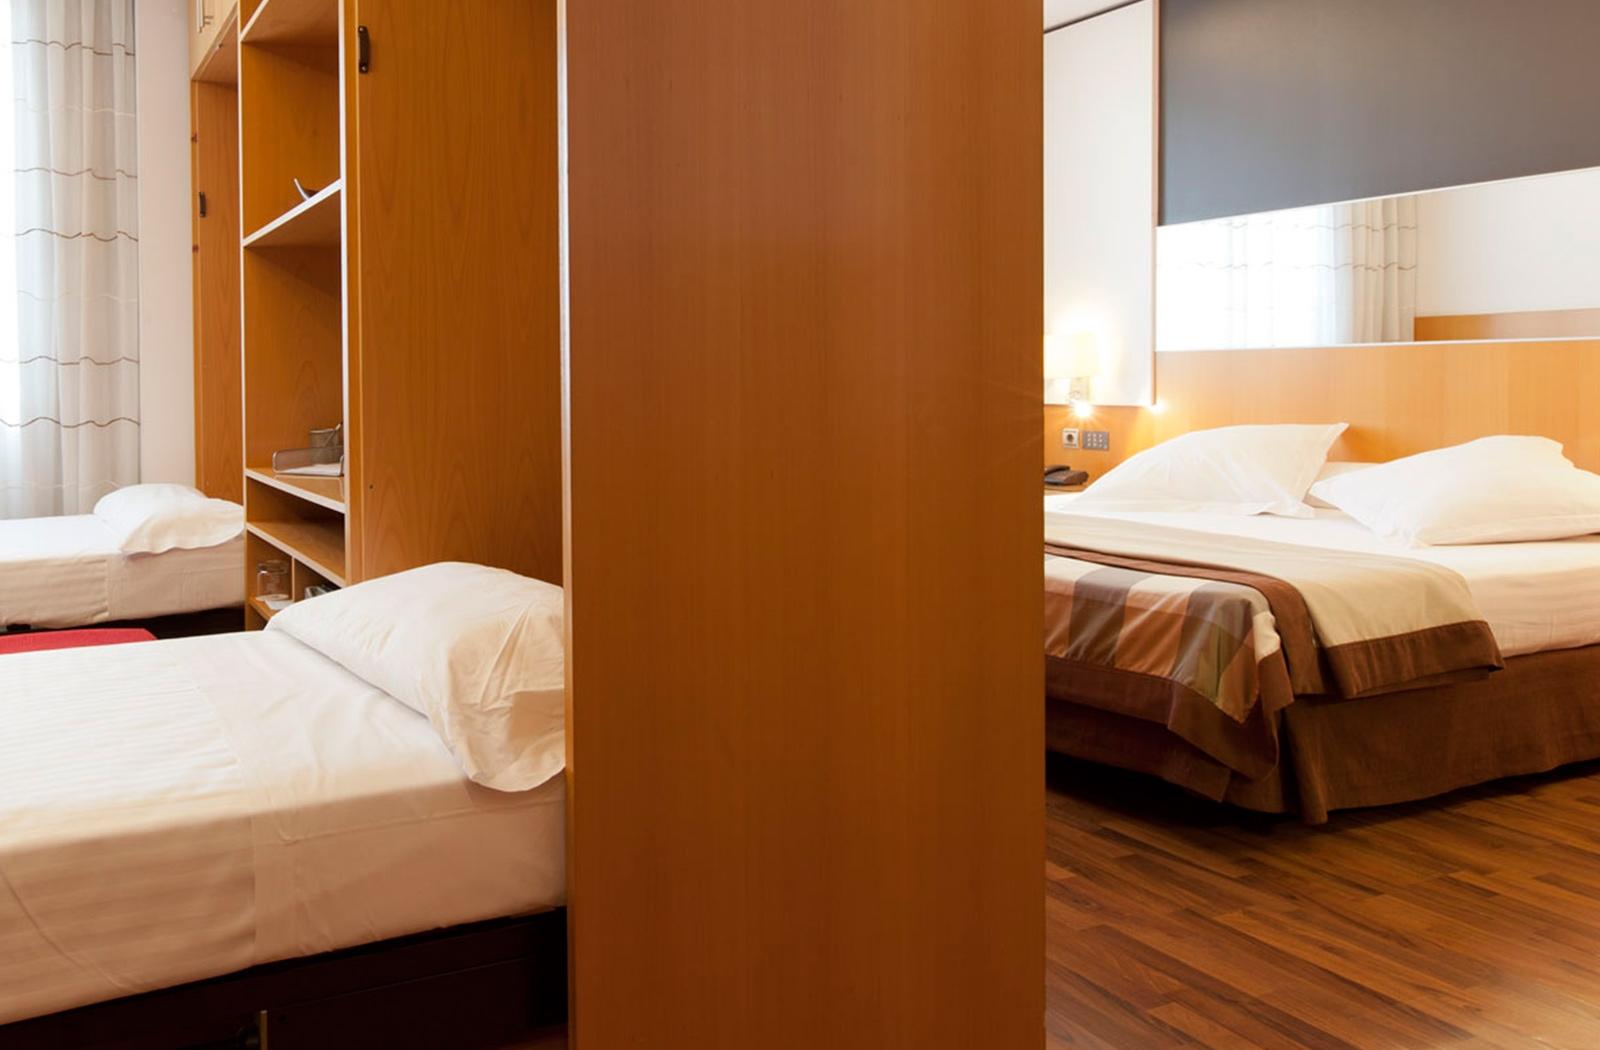 Hotel Icaria Barcelona habitacion Family Room